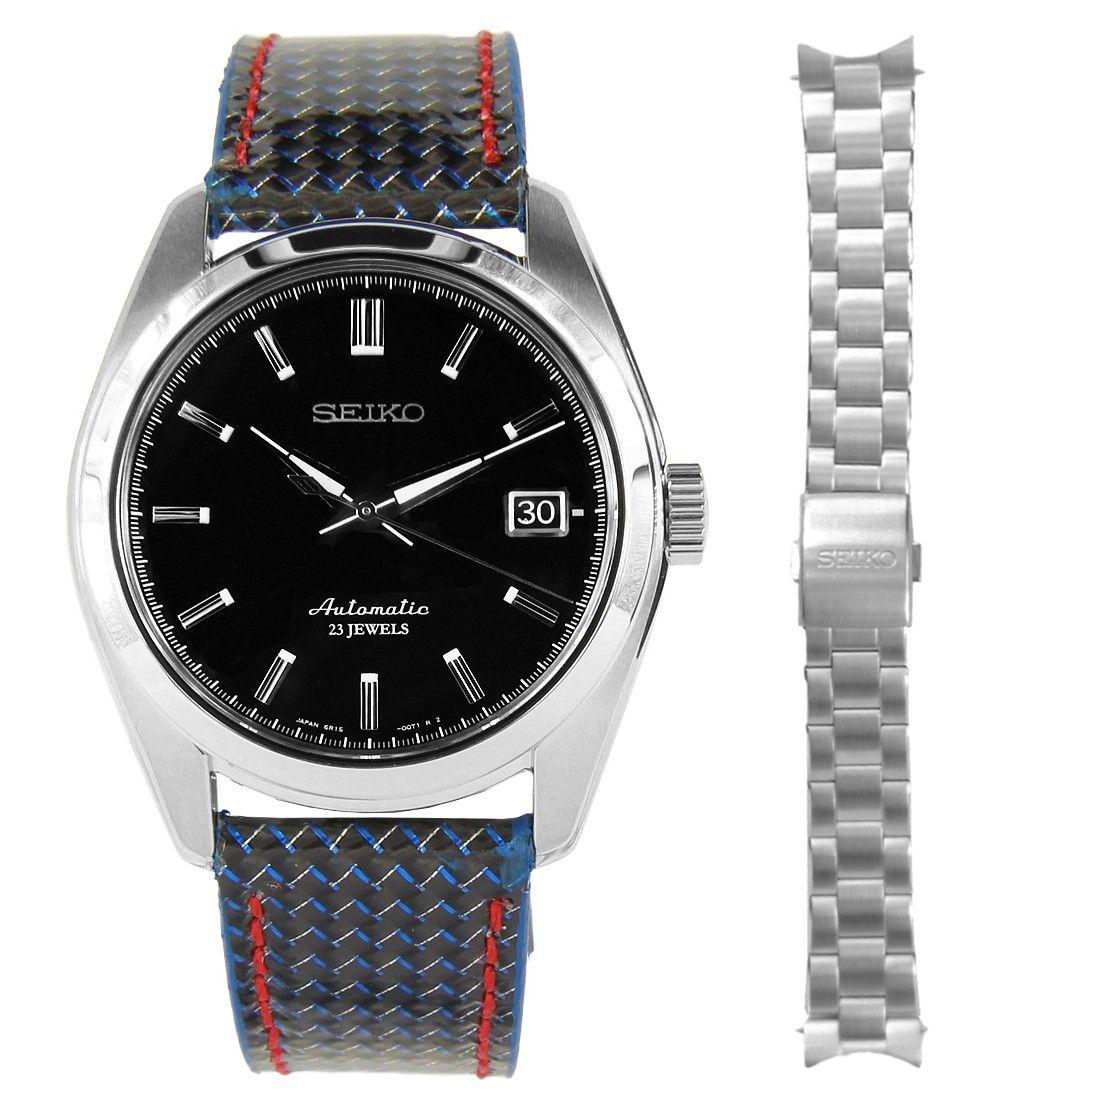 SARB033 SARB033J SARB033J1 Seiko Automatic Male Watch (With